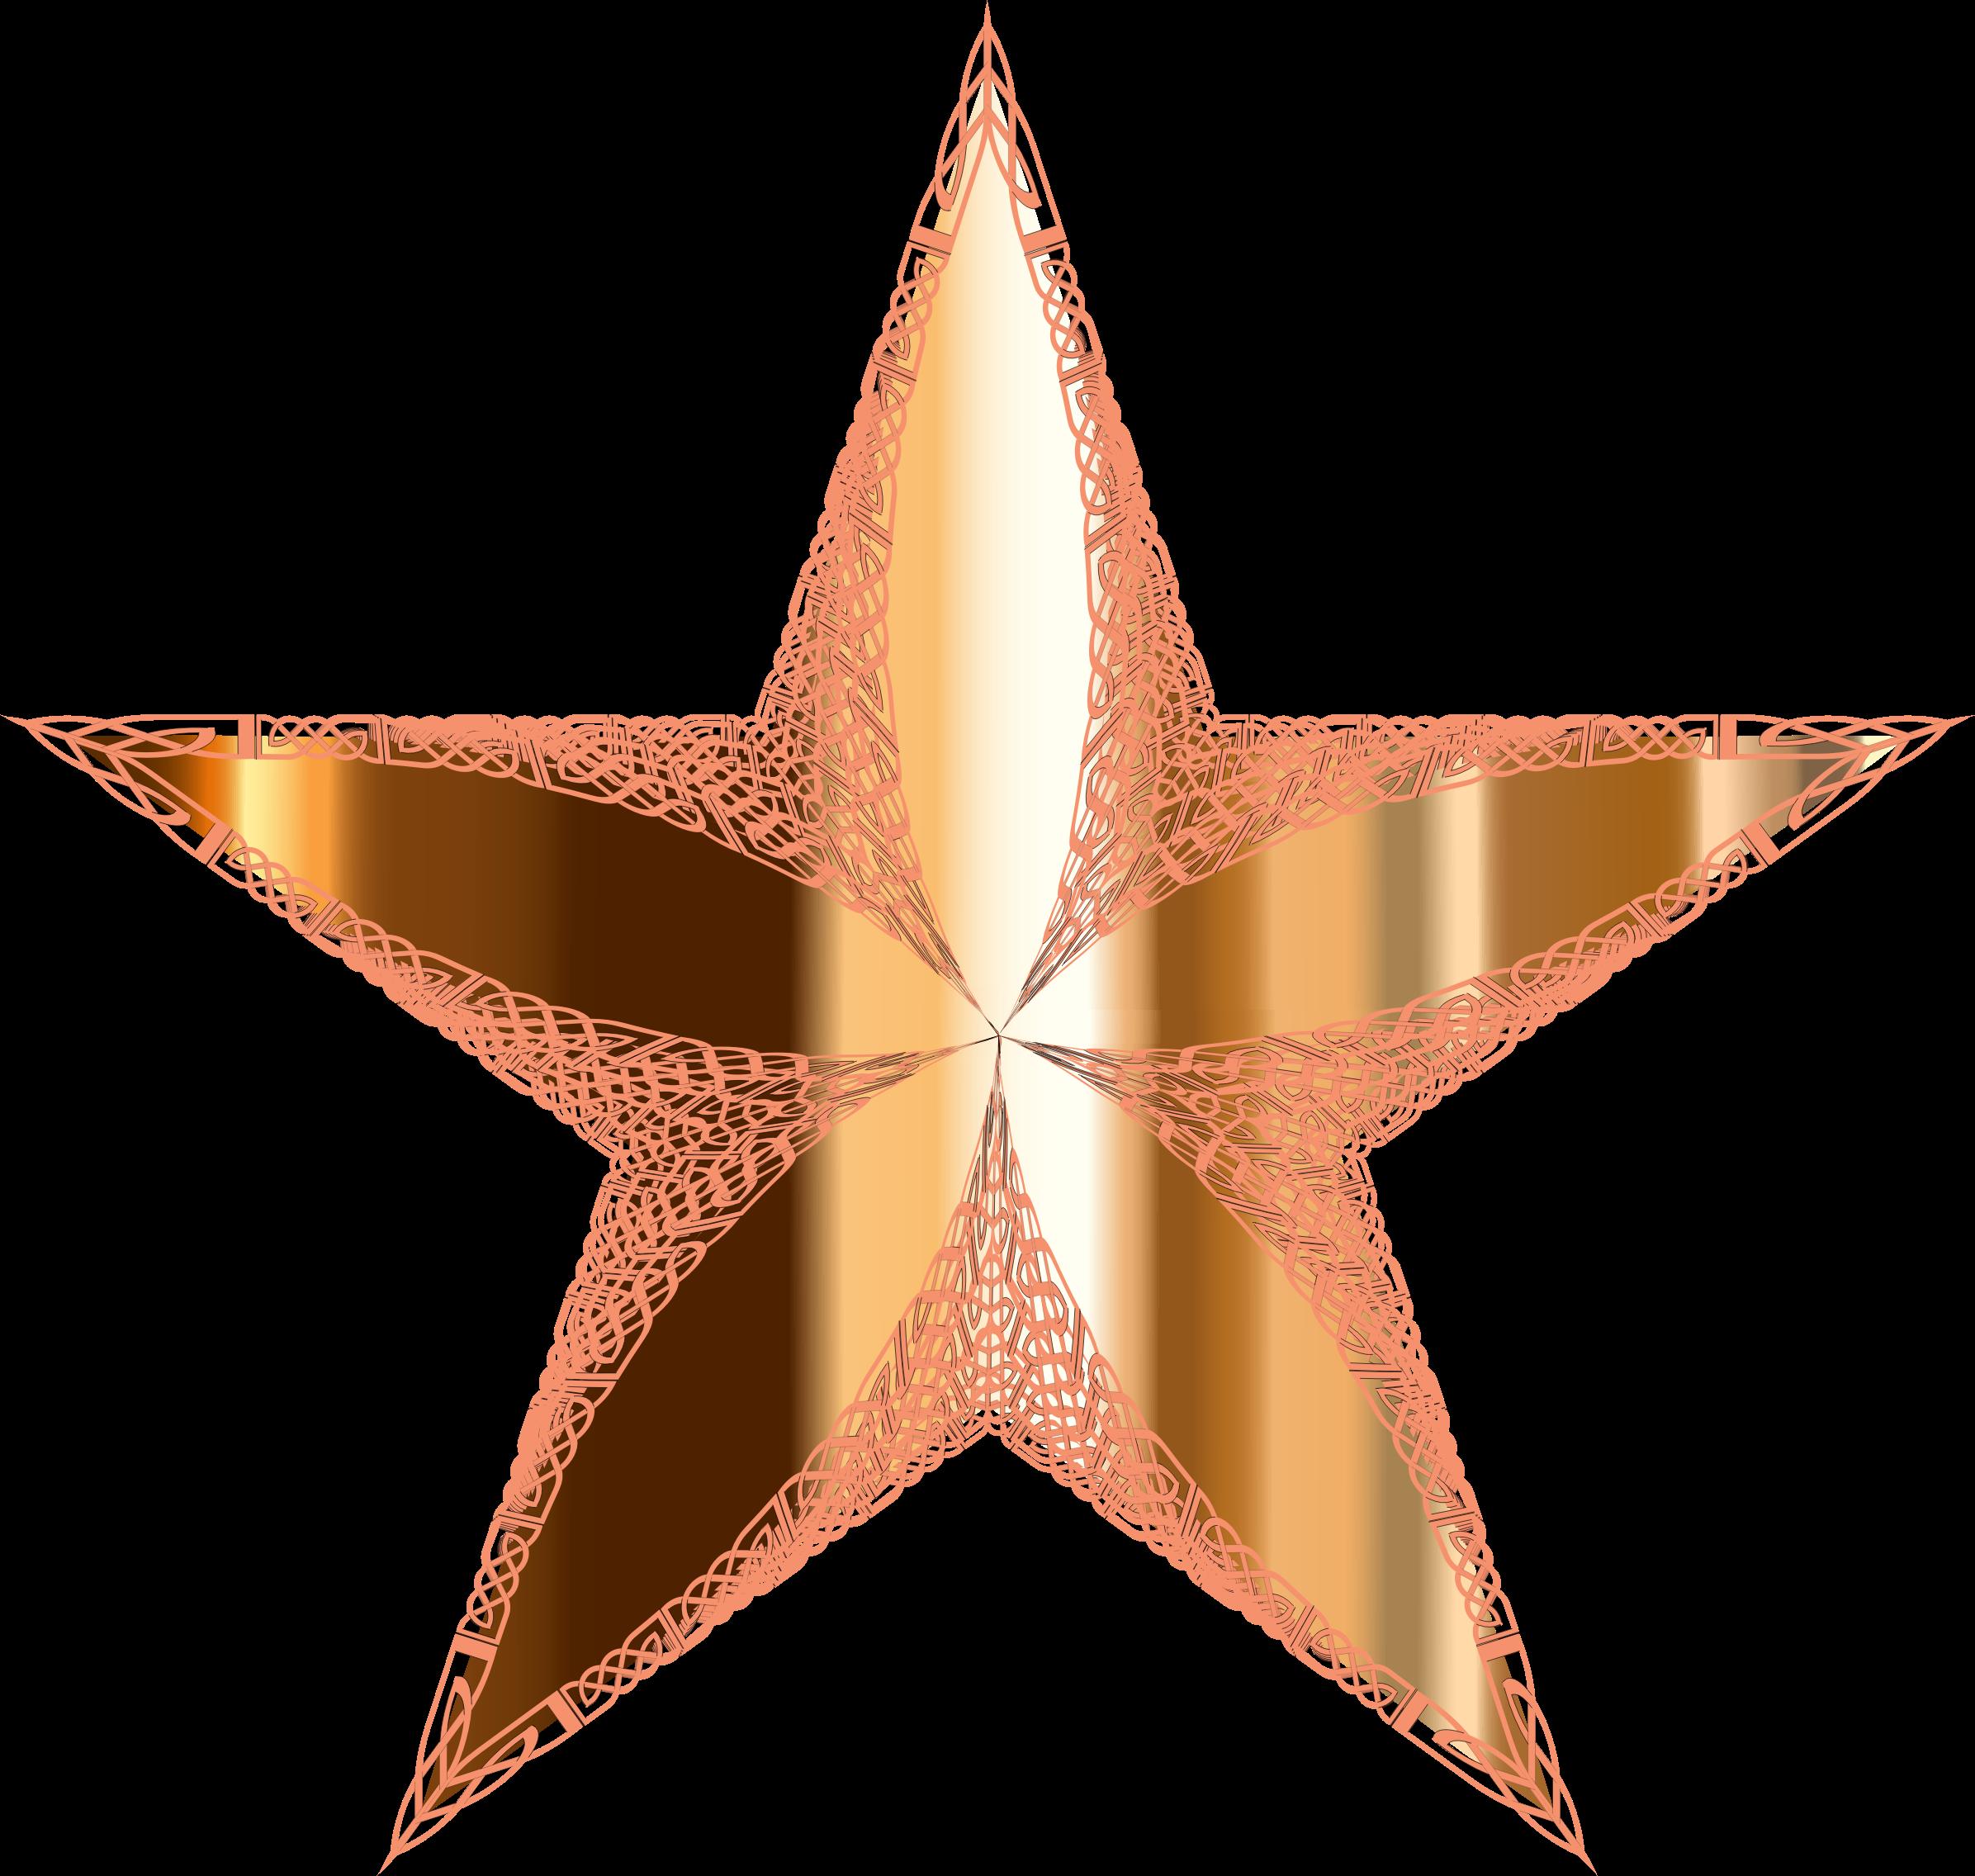 Celtic star clipart picture stock Clipart - Ornamental Metallic Star picture stock